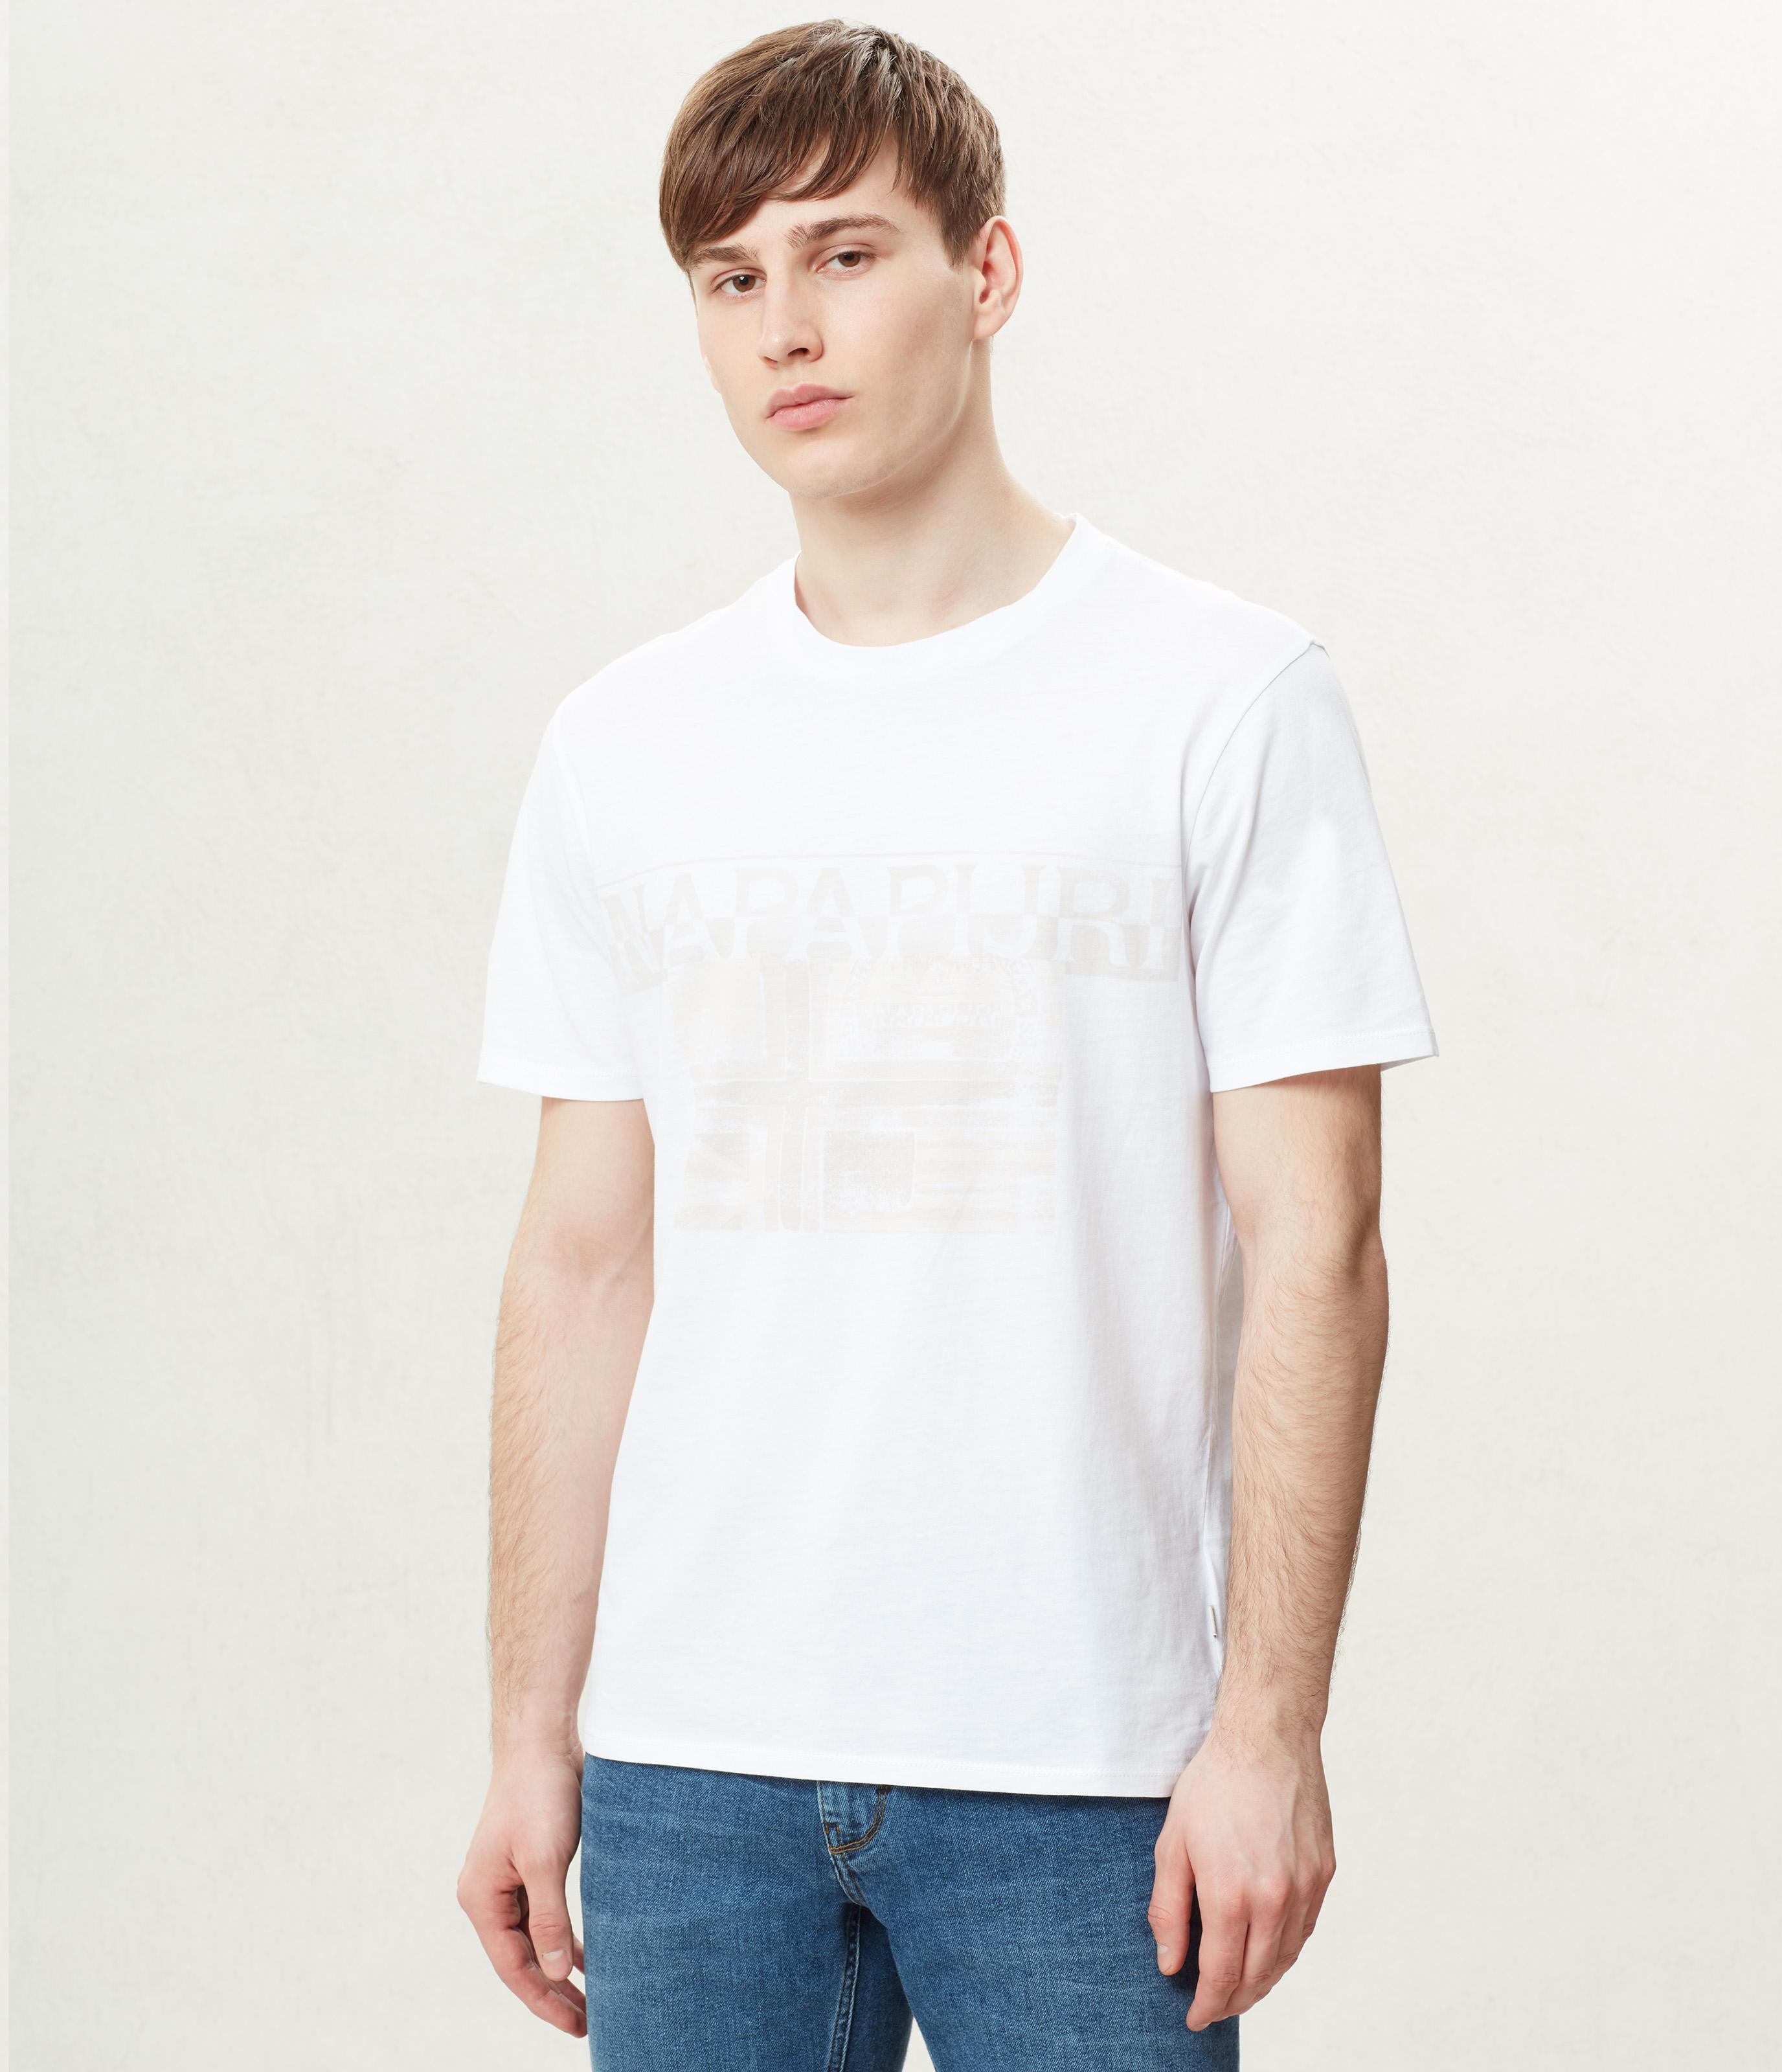 SAWY BRIGHT WHITE